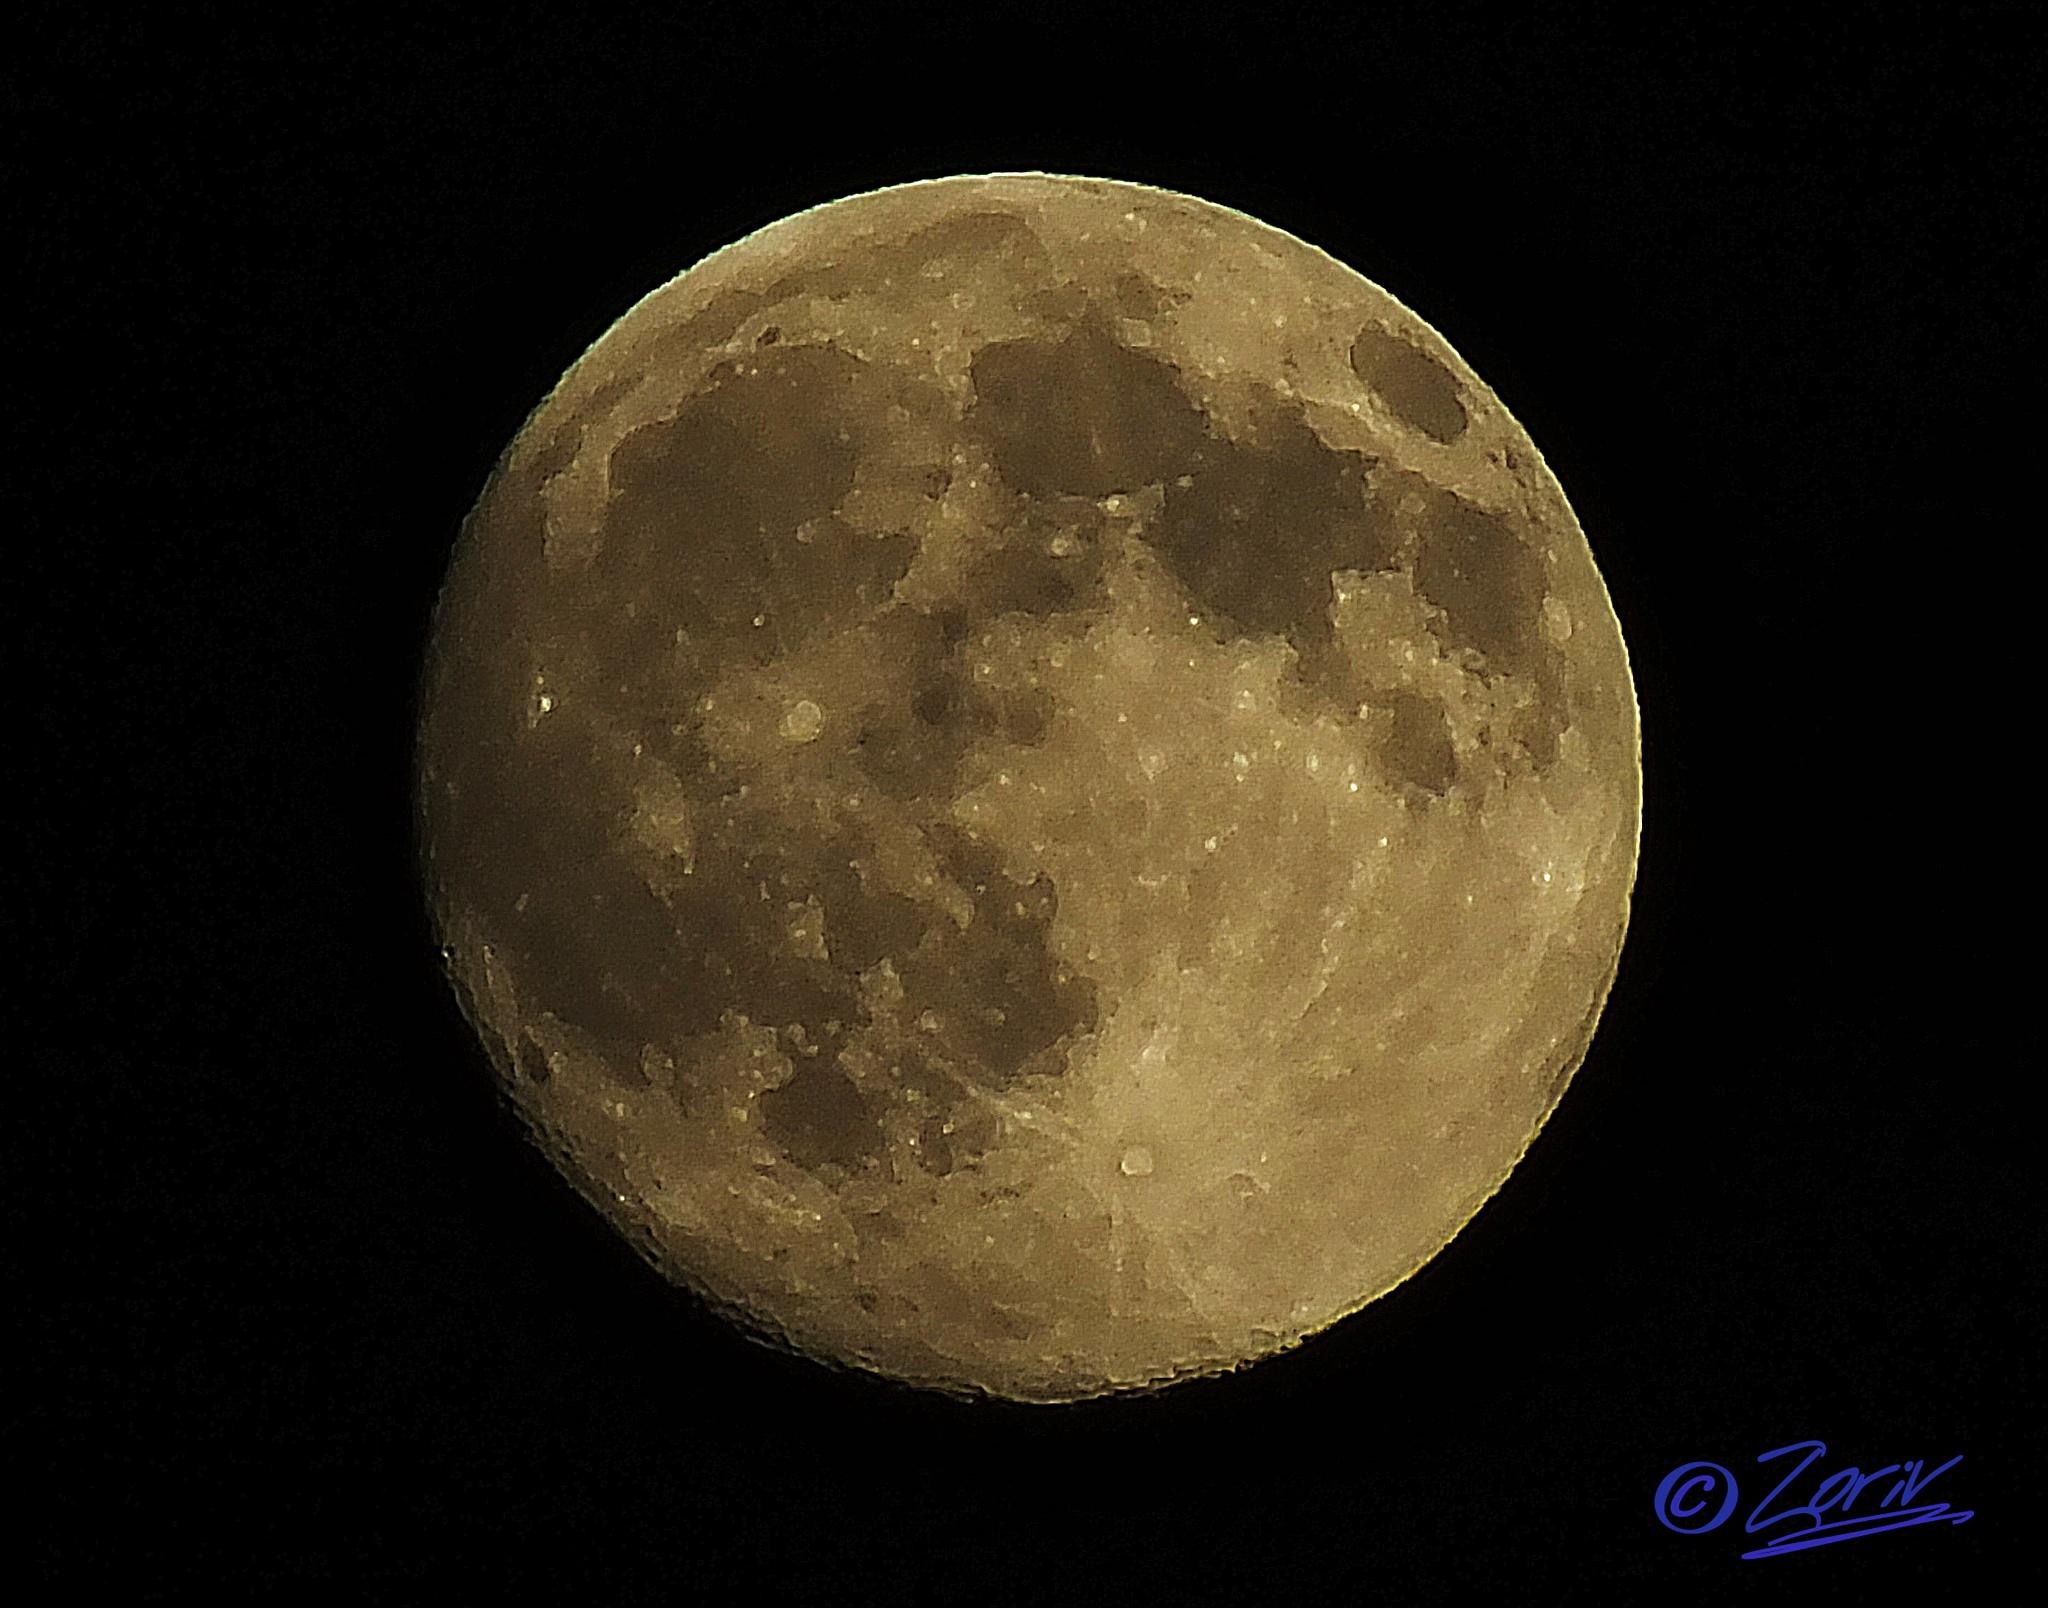 It's a Full Moon tonight by zoriv